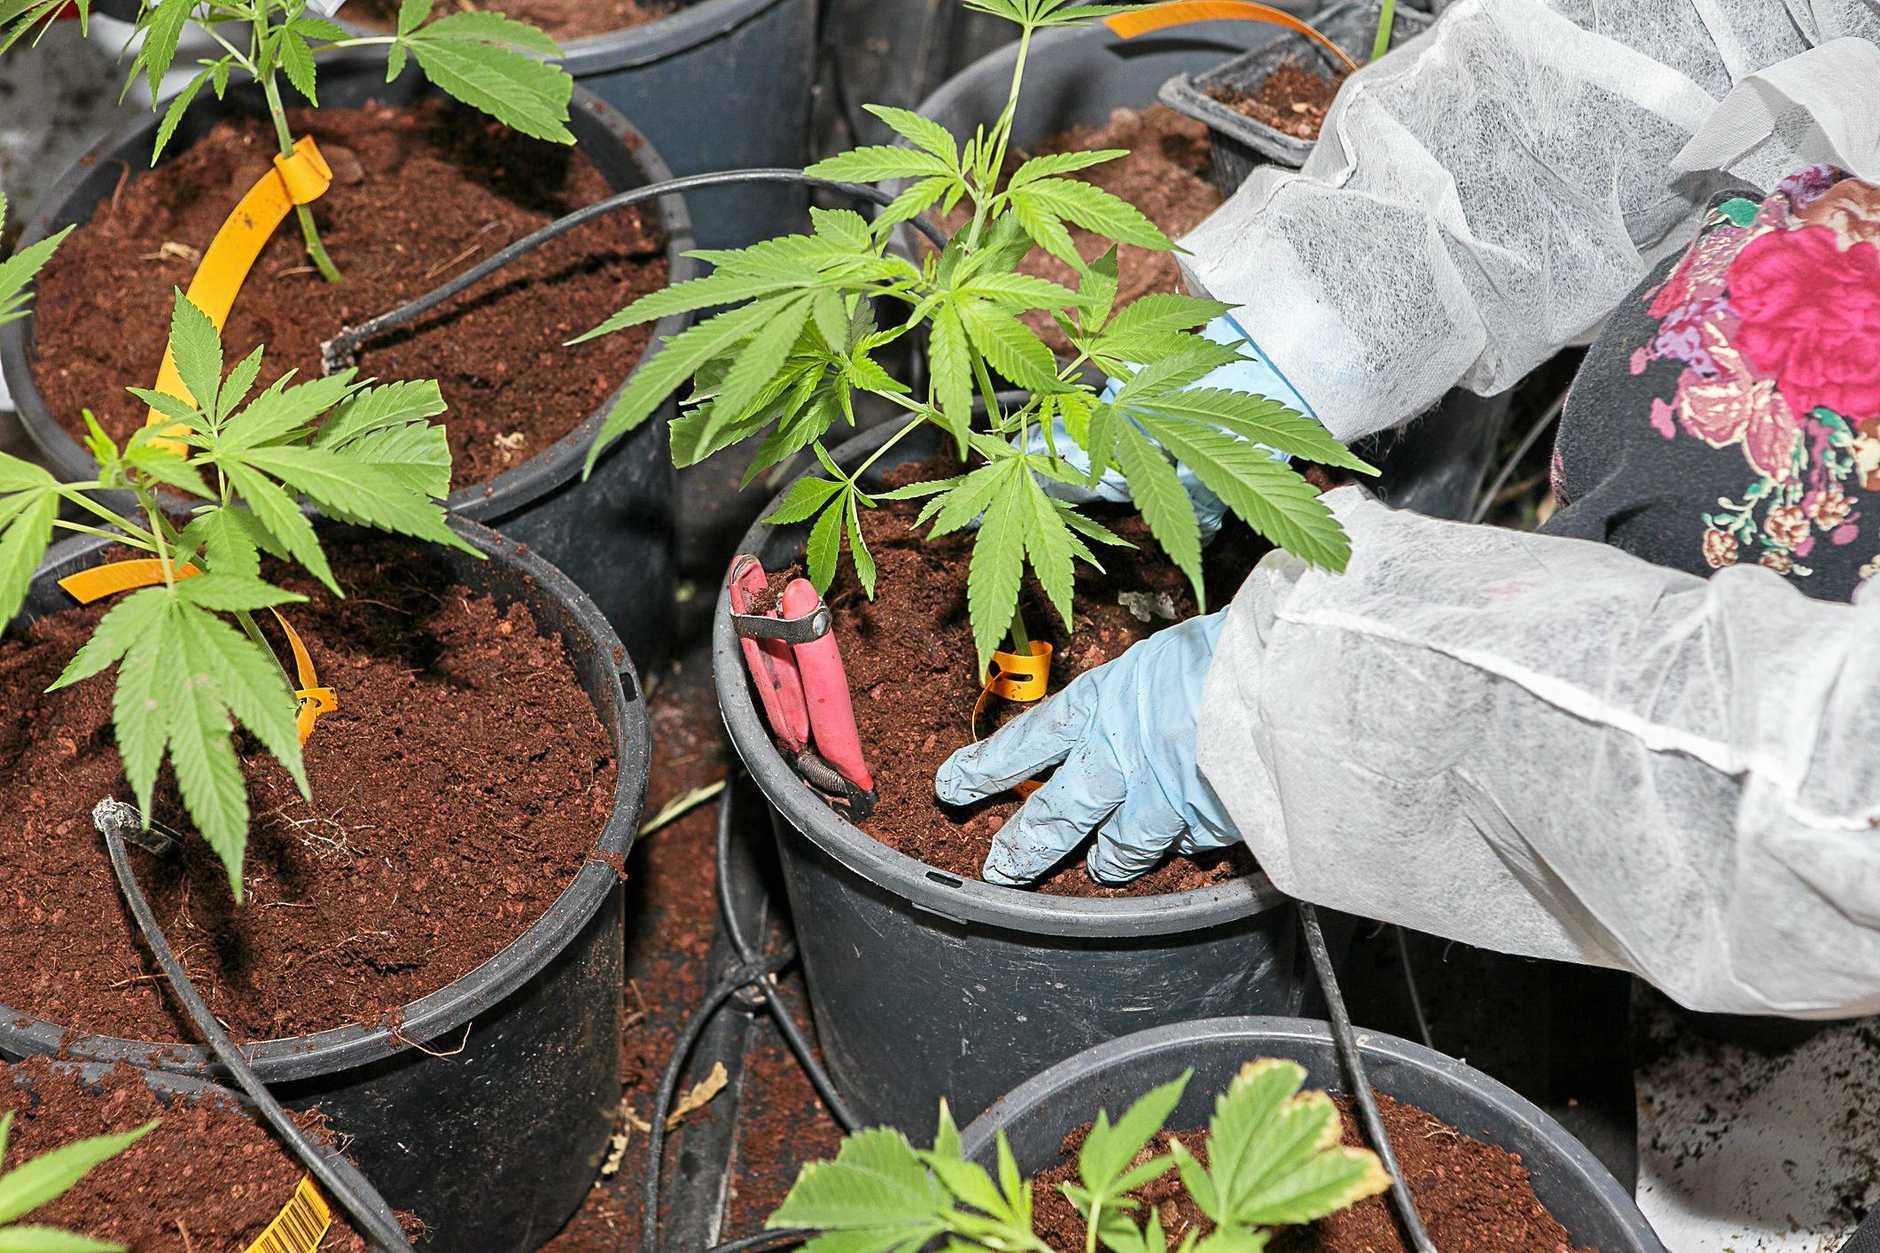 Israel's Tikun Olam has provided the mother stock for Medifarm's medicinal marijuana plants.